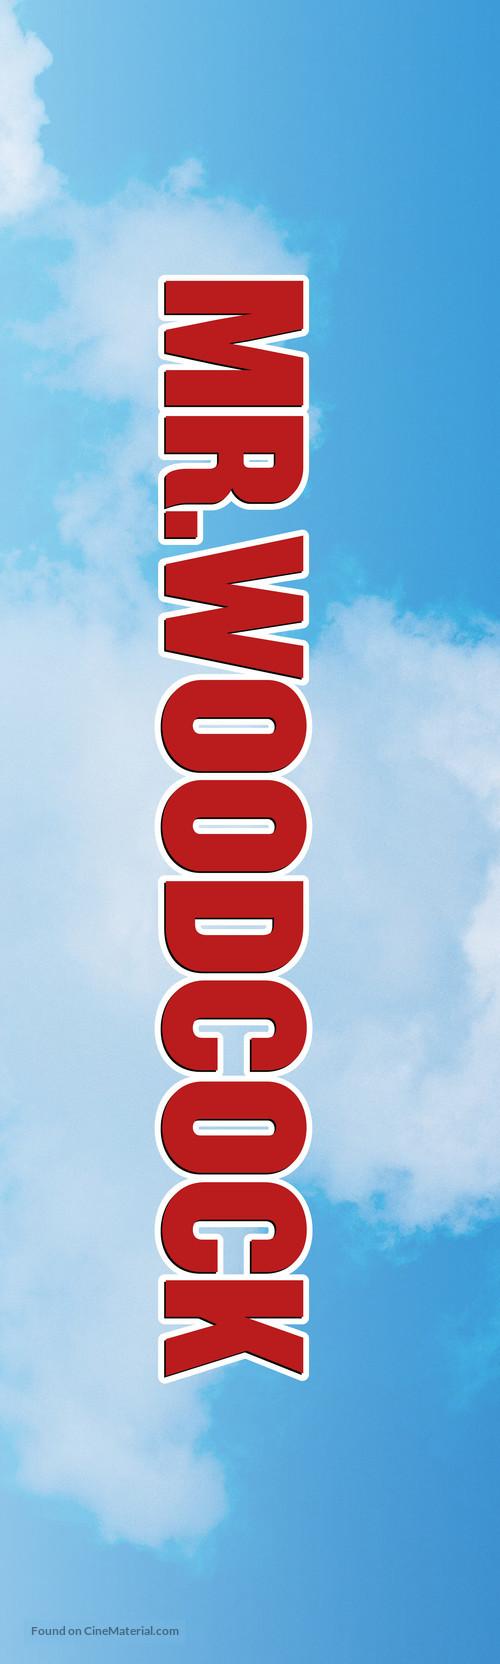 Mr. Woodcock - Key art